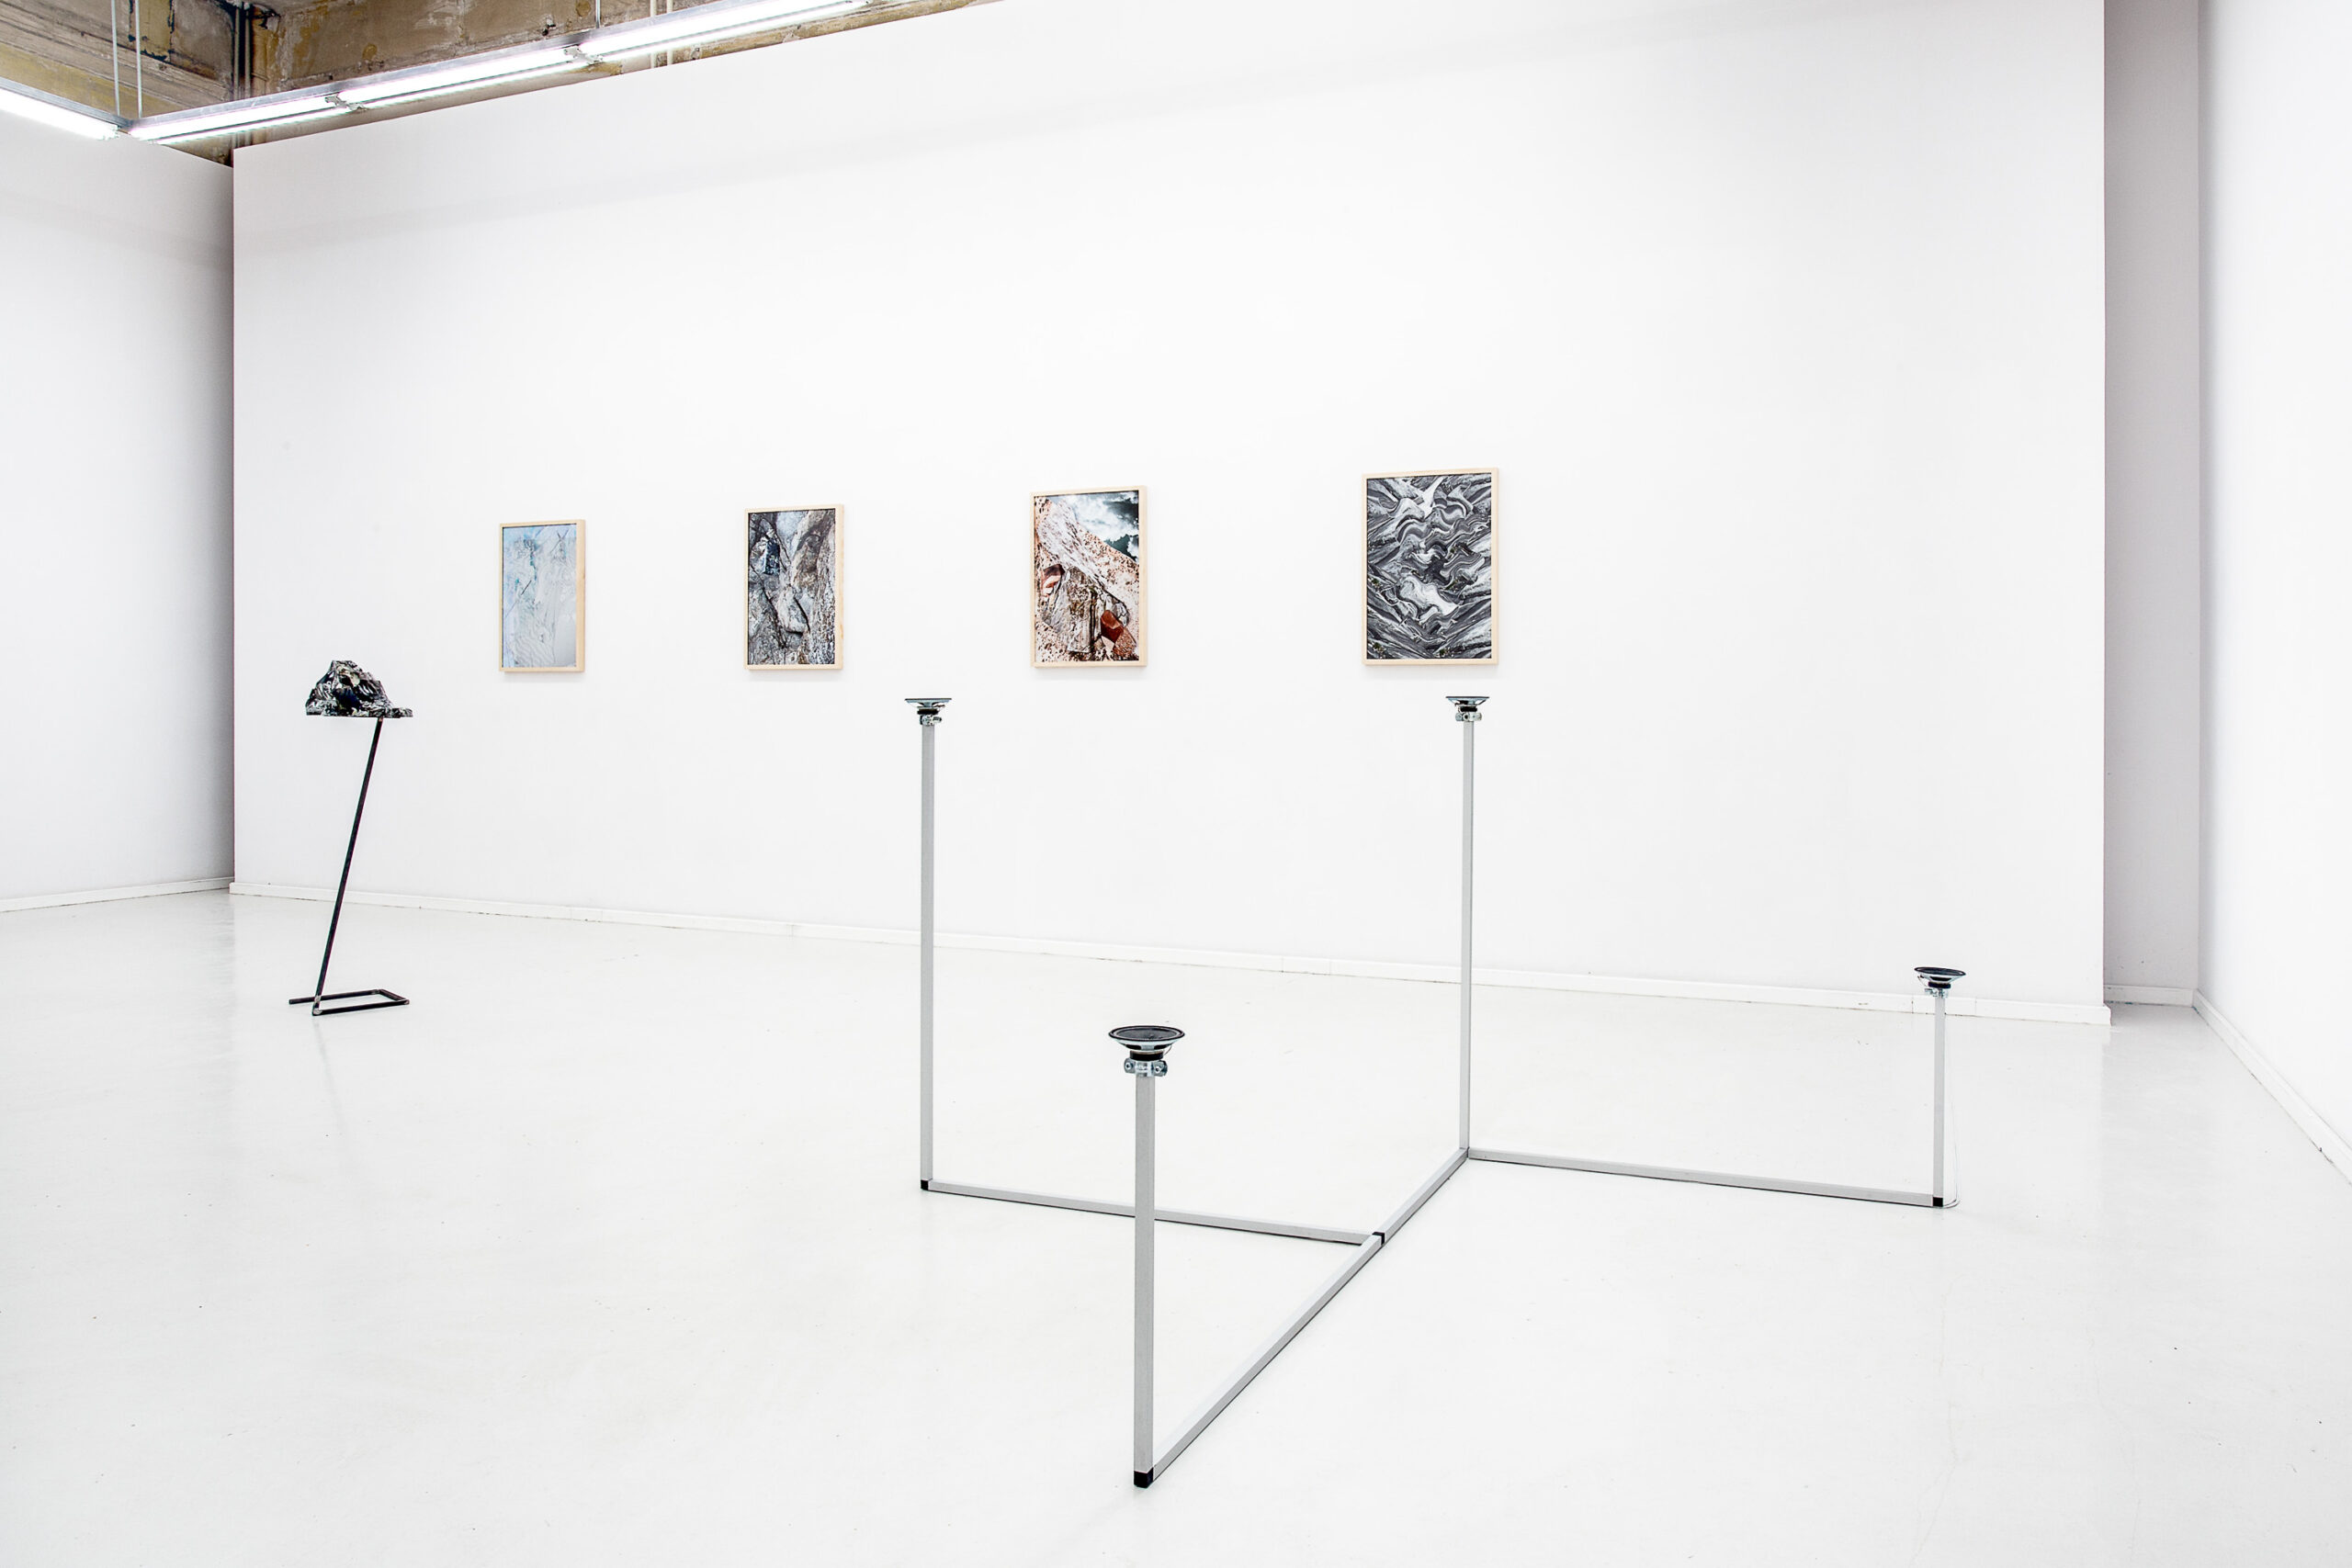 Jacek Doroszenko - How to travel - Sound installation - Sculpture - Exhibition - Propaganda Gallery 01